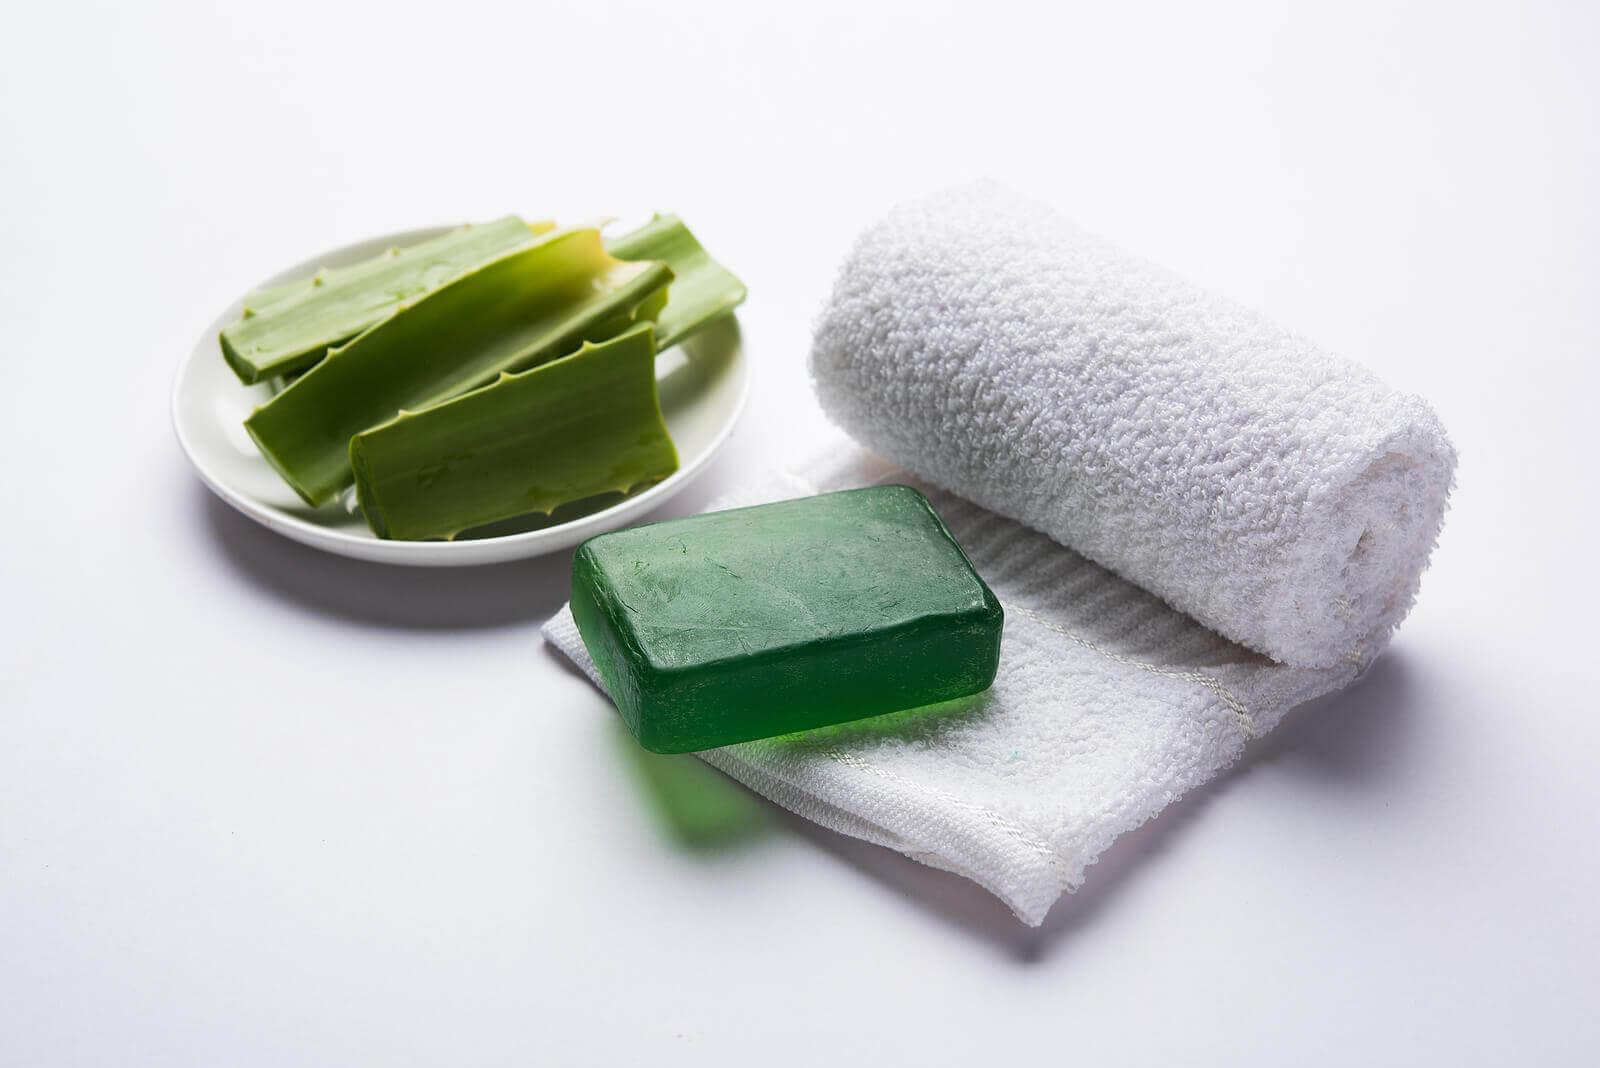 Aloe pieces, aloe soap, and a white towel.